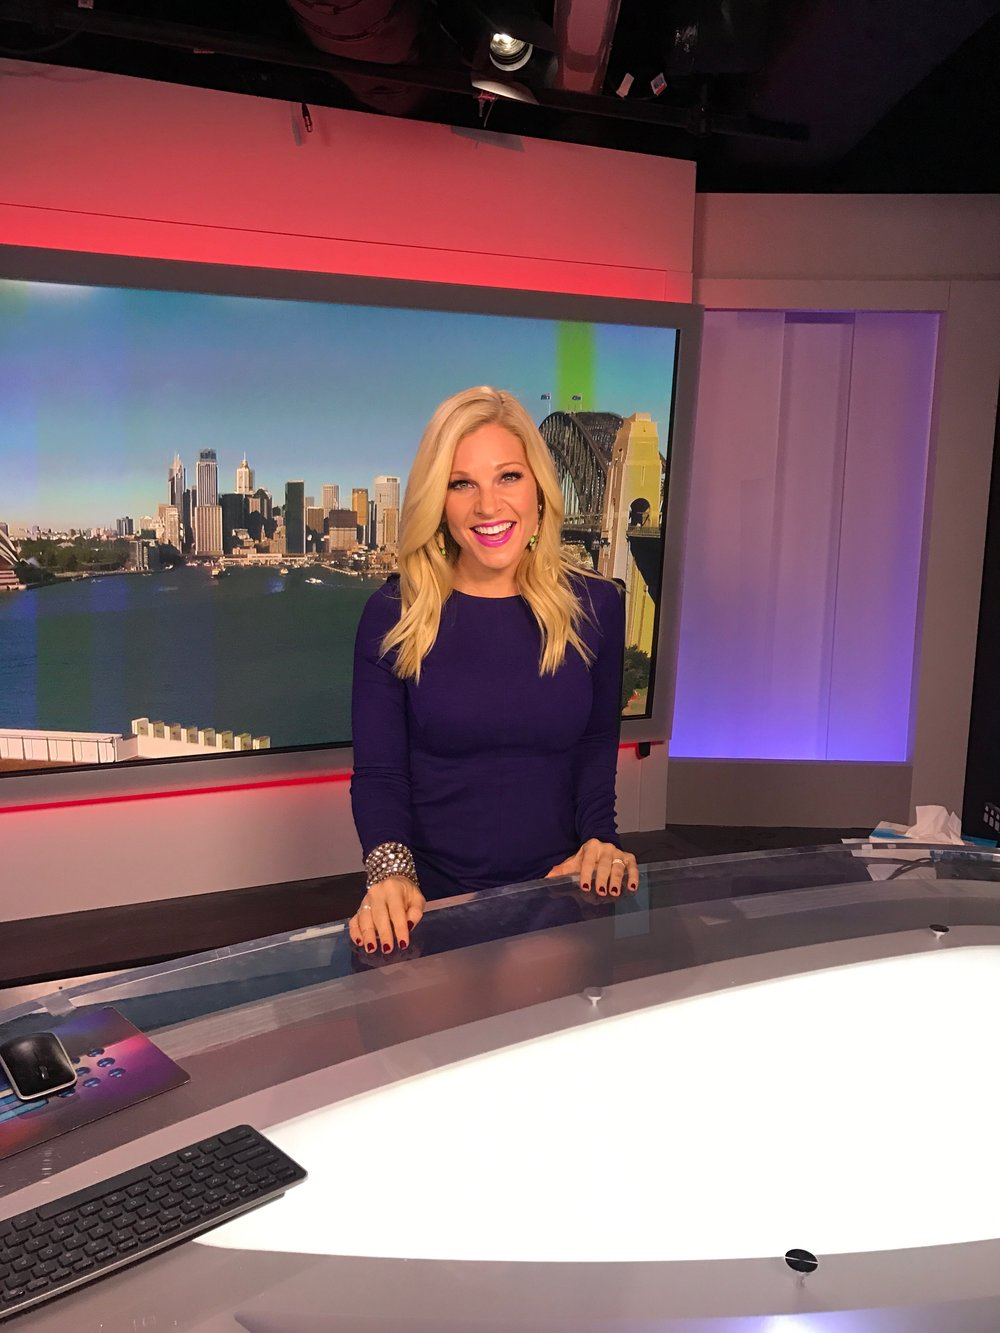 Anna Kooiman The Today Show Australia AnnaKooiman.com fitness travel lifestyle 2017